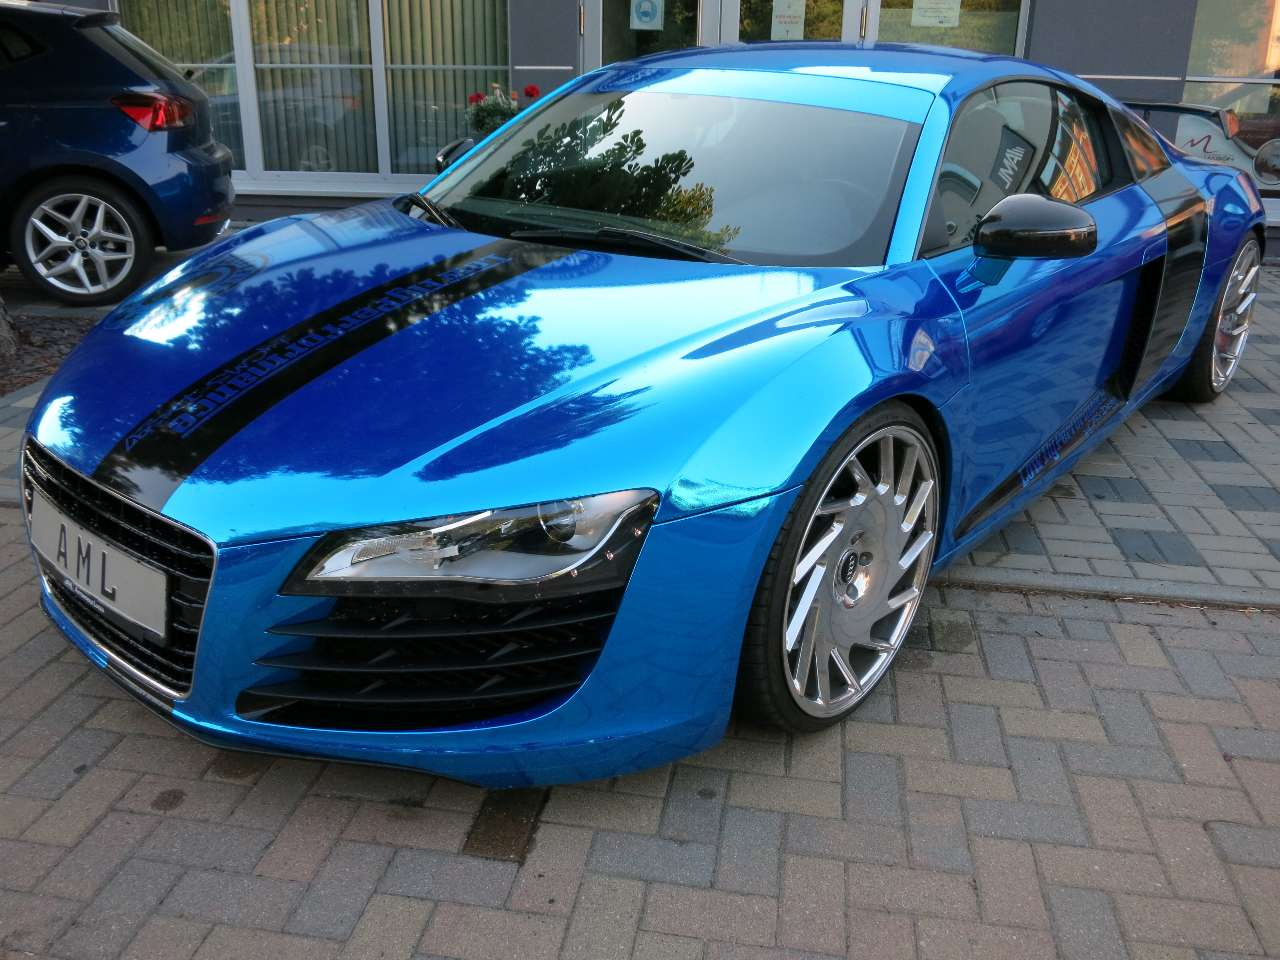 "Audi R8 4.2 FSI quattro HTS Sportauspuff 20"" VOSSEN ALU"